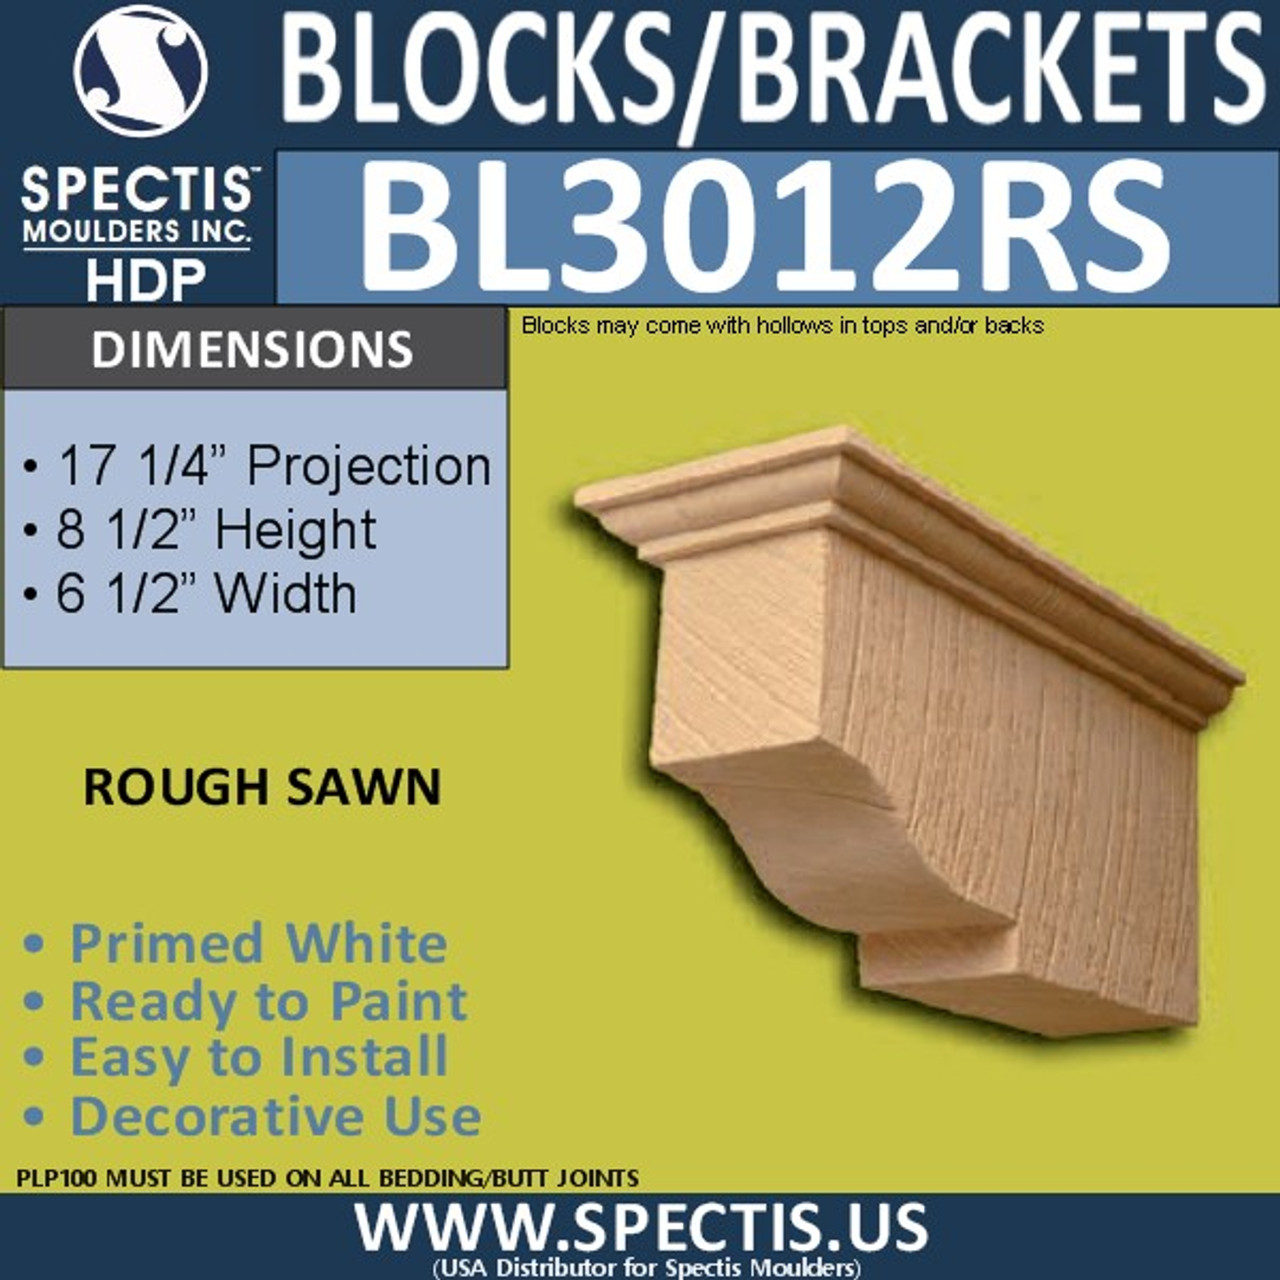 "BL3012RS Rough Sawn Eave Block or Bracket 6.5""W x 8.5""H x 17.25""P"